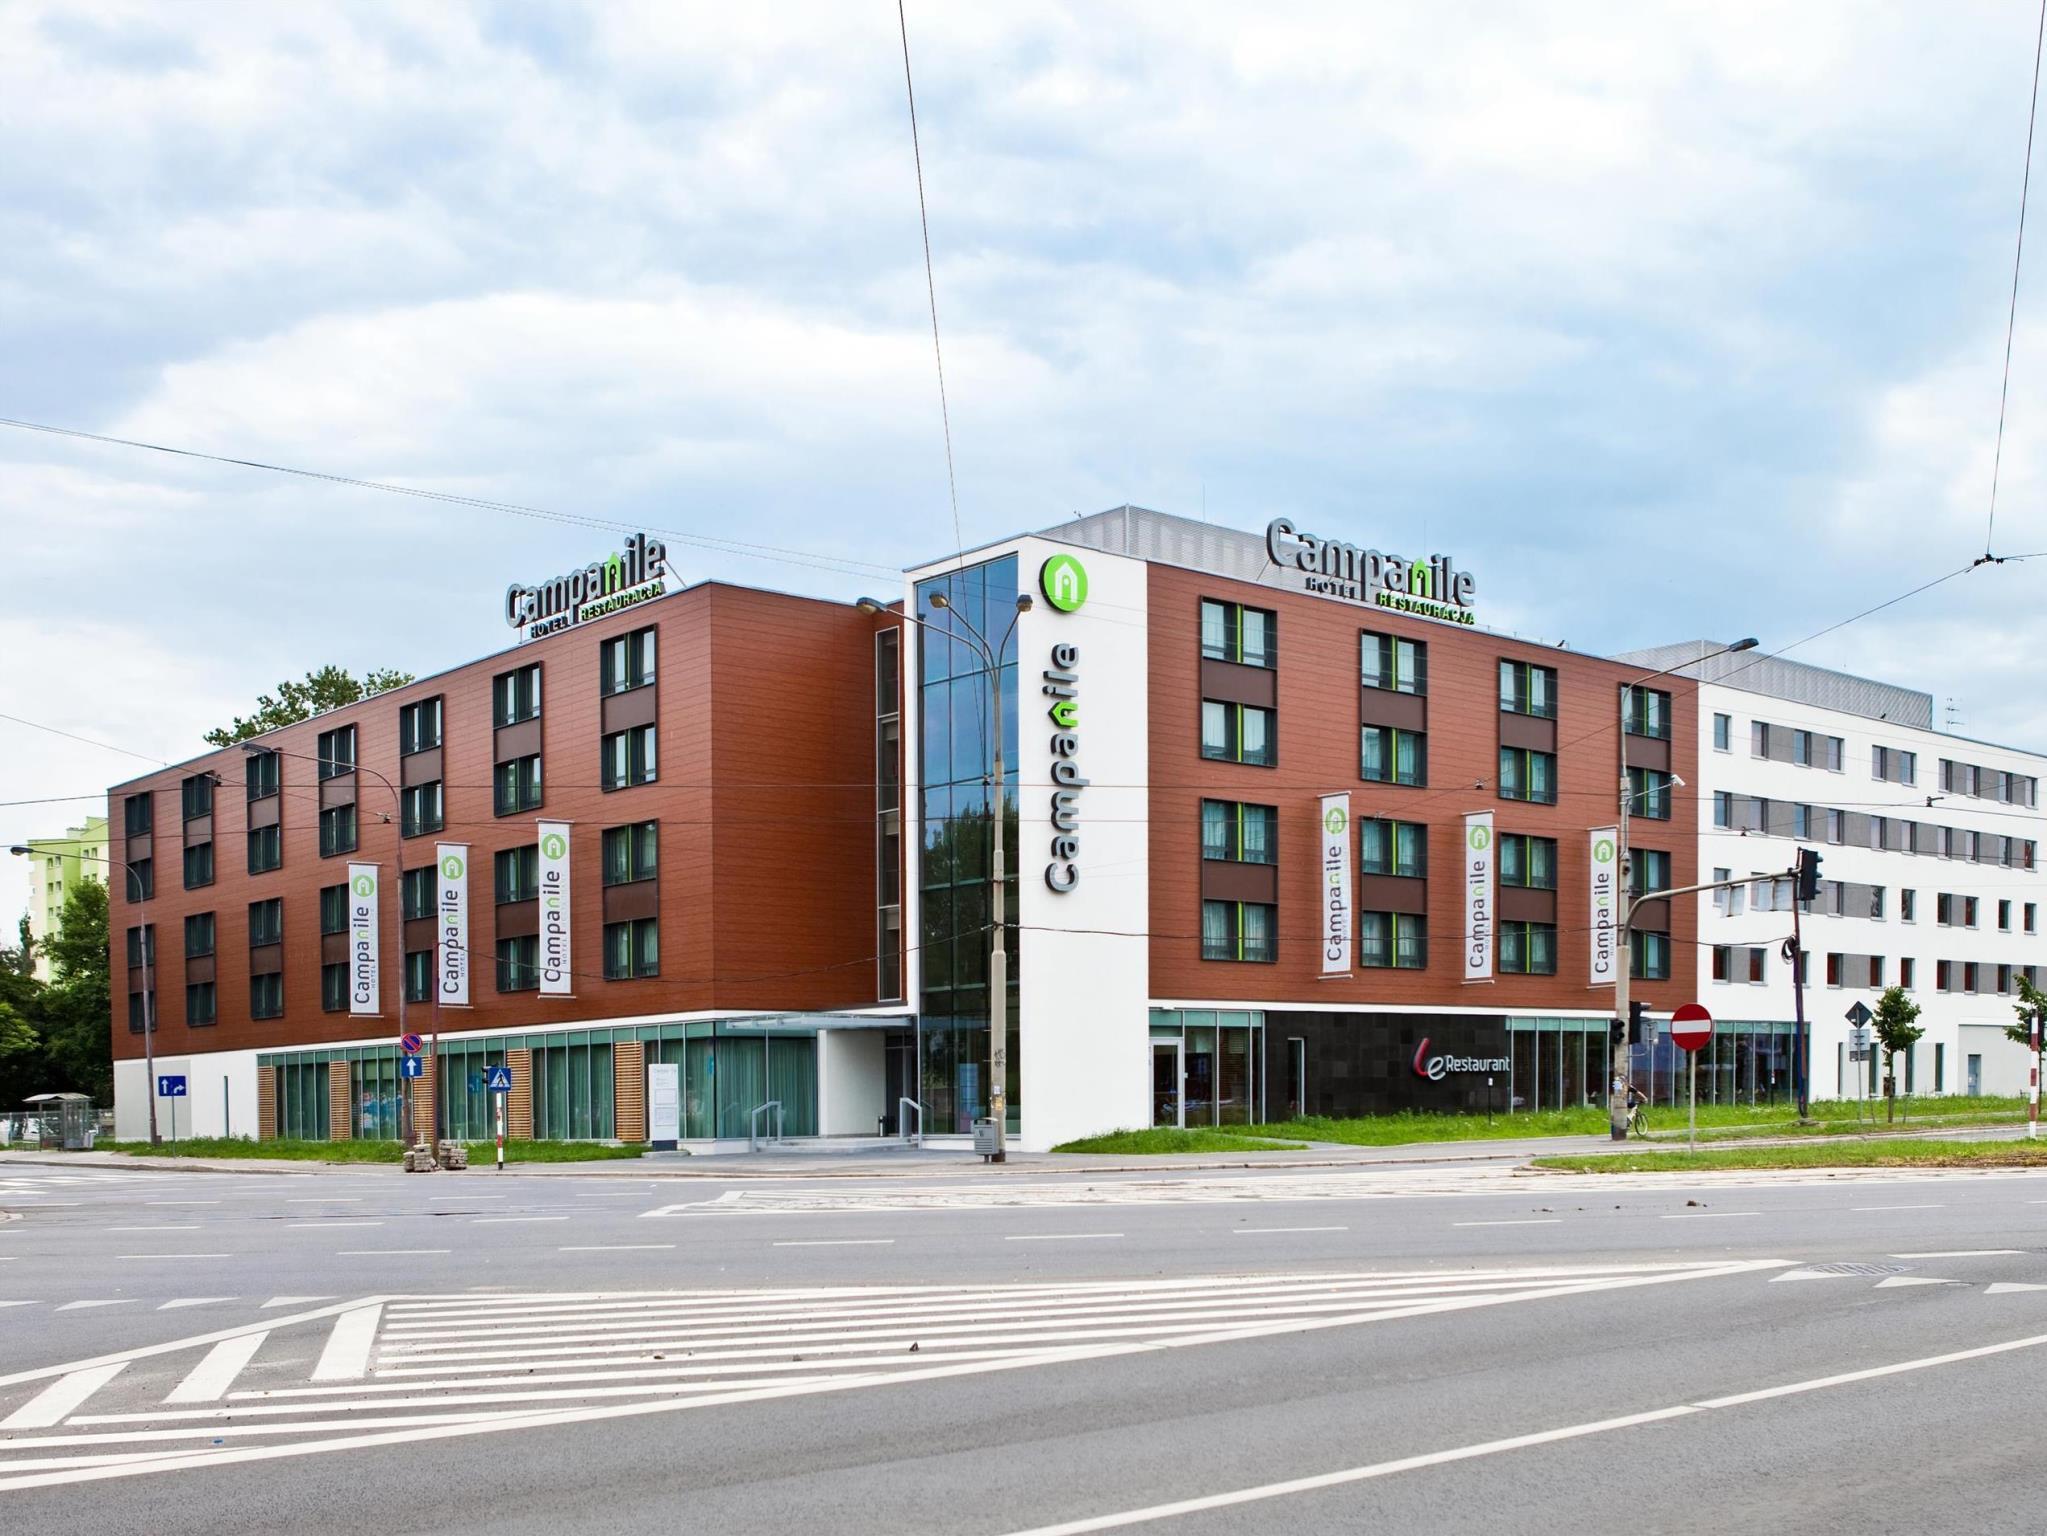 Campanile Hotel Wroclaw Centrum